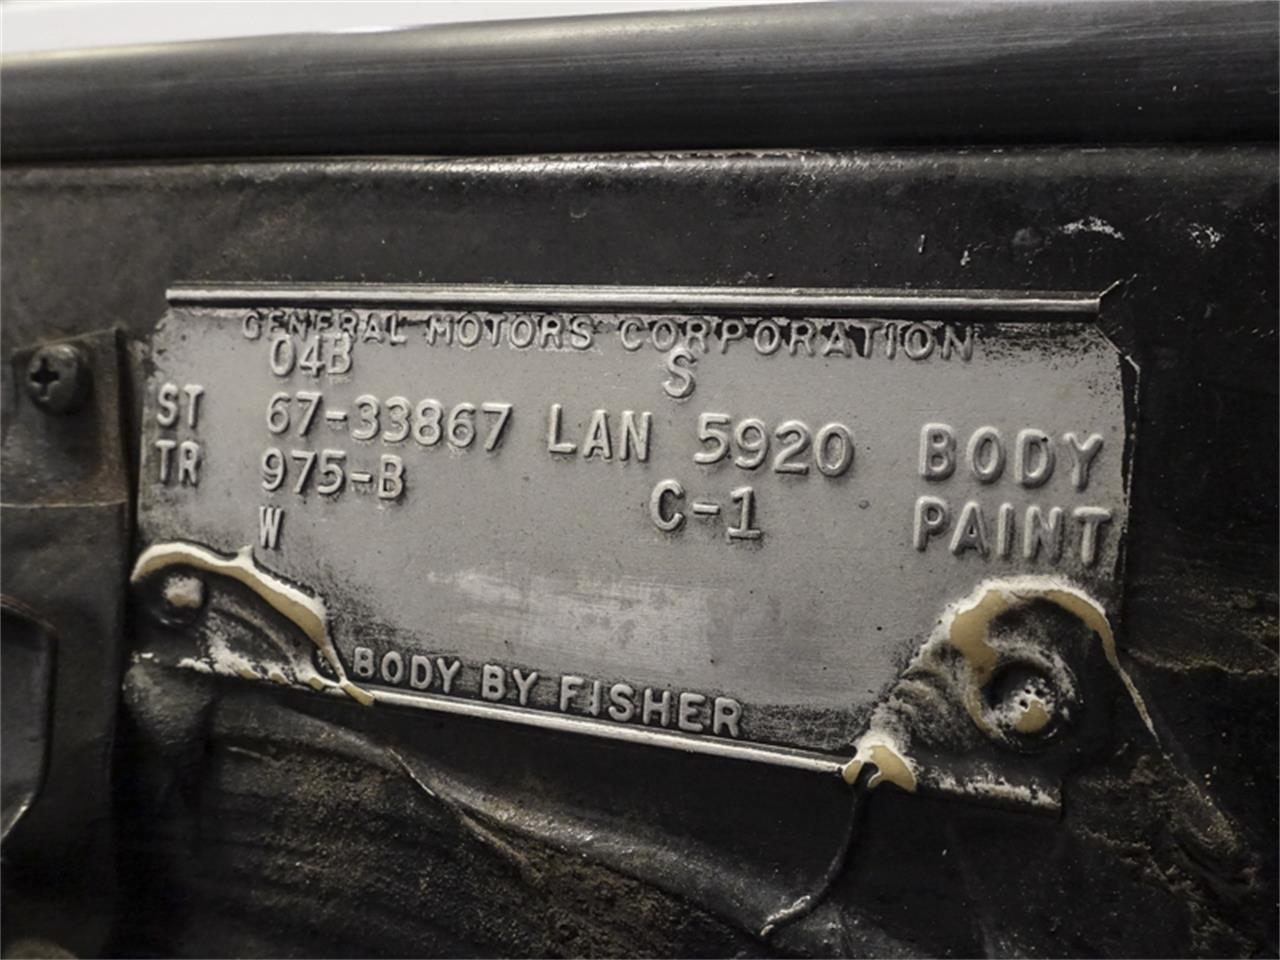 Large Picture of Classic 1967 Cutlass Supreme located in Saint Louis Missouri - $29,900.00 - QK0F